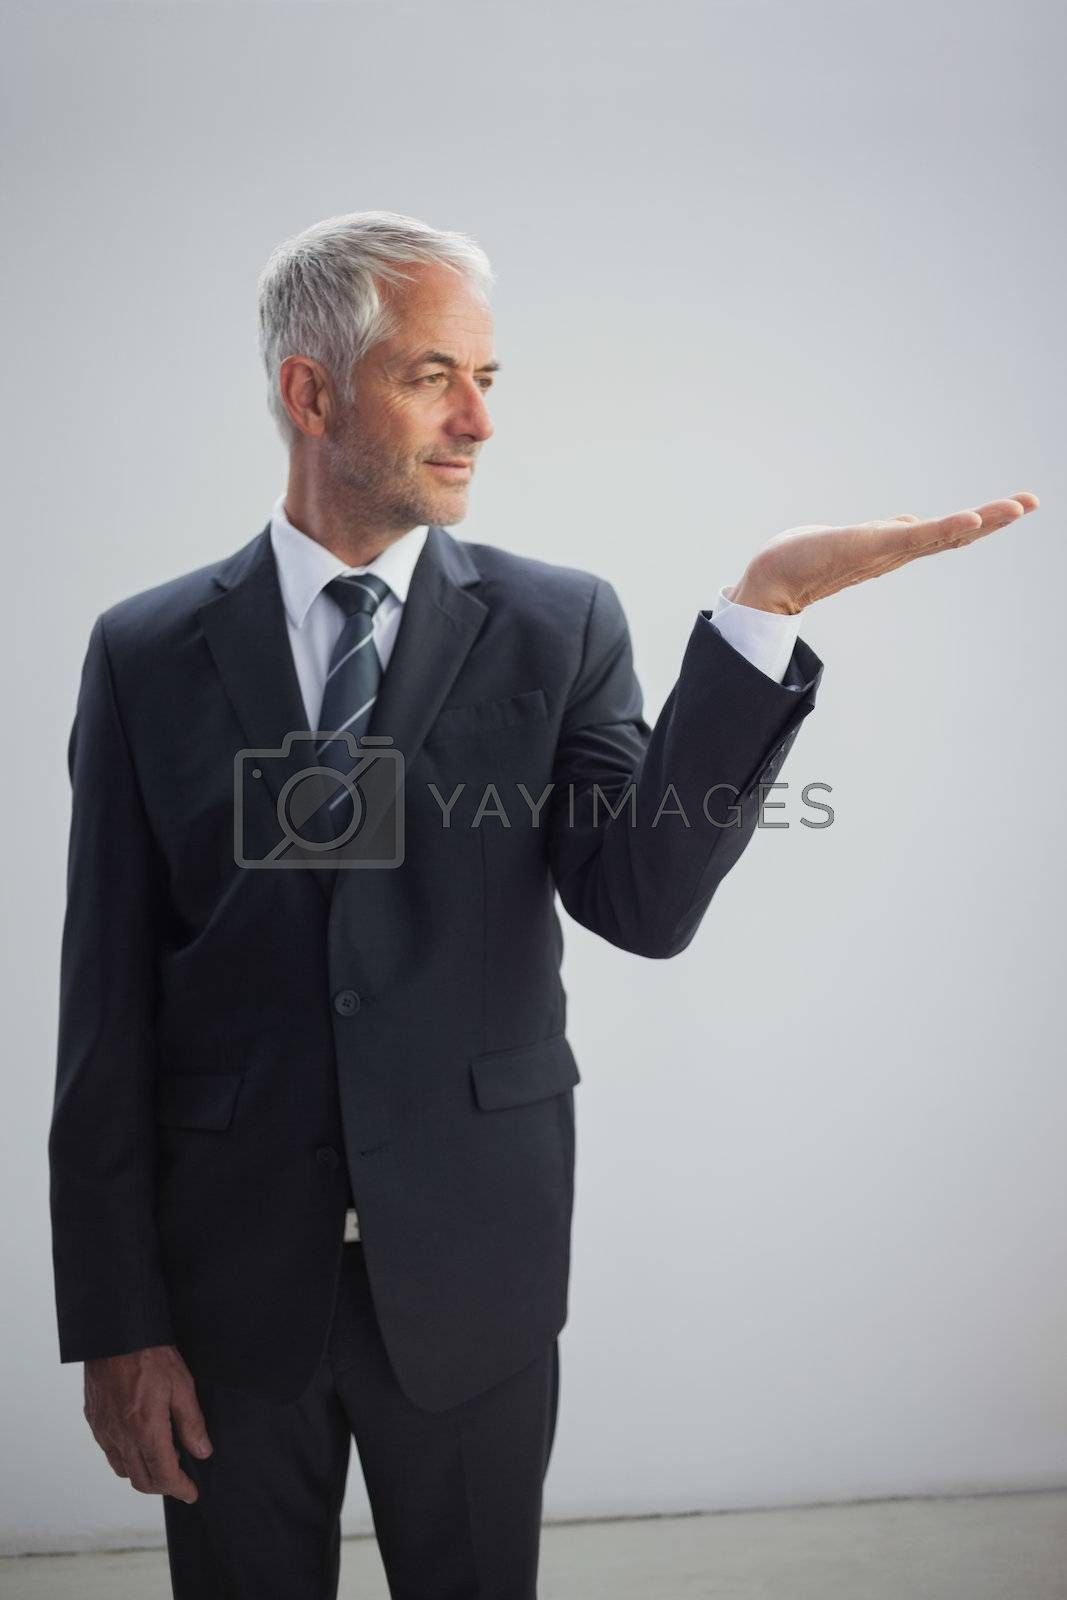 Unsmiling businessman presenting something by Wavebreakmedia